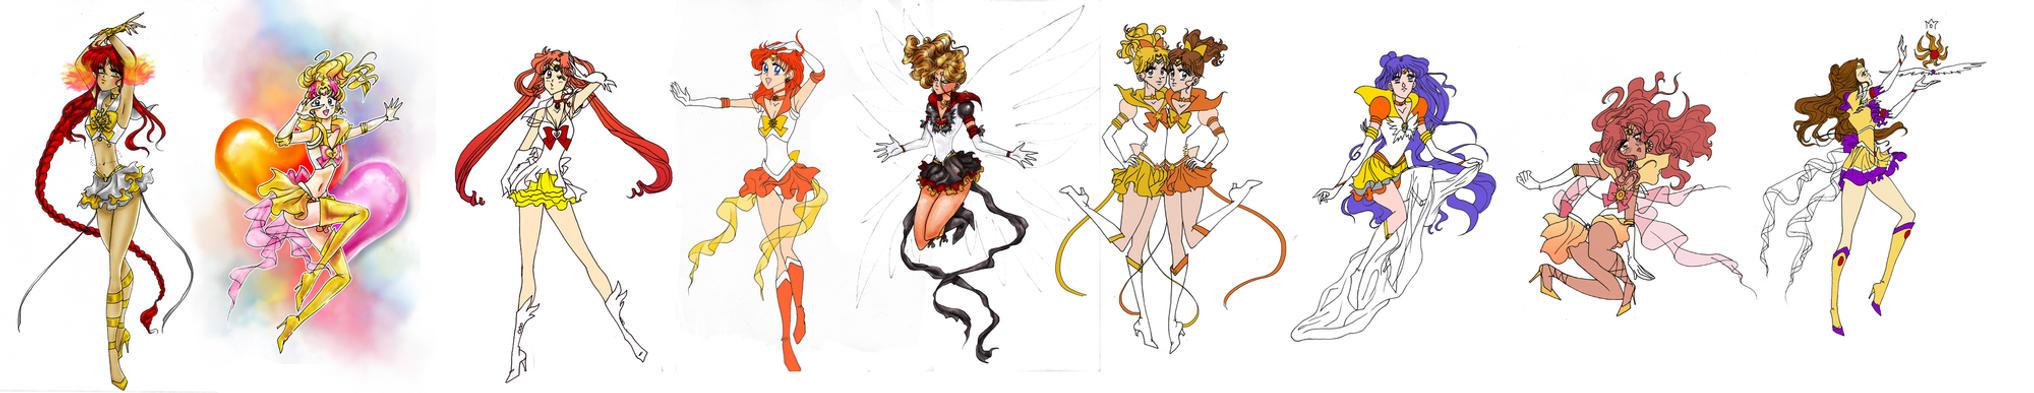 The Sailor Sun Project (update June 23rd 2013) by goddessredd